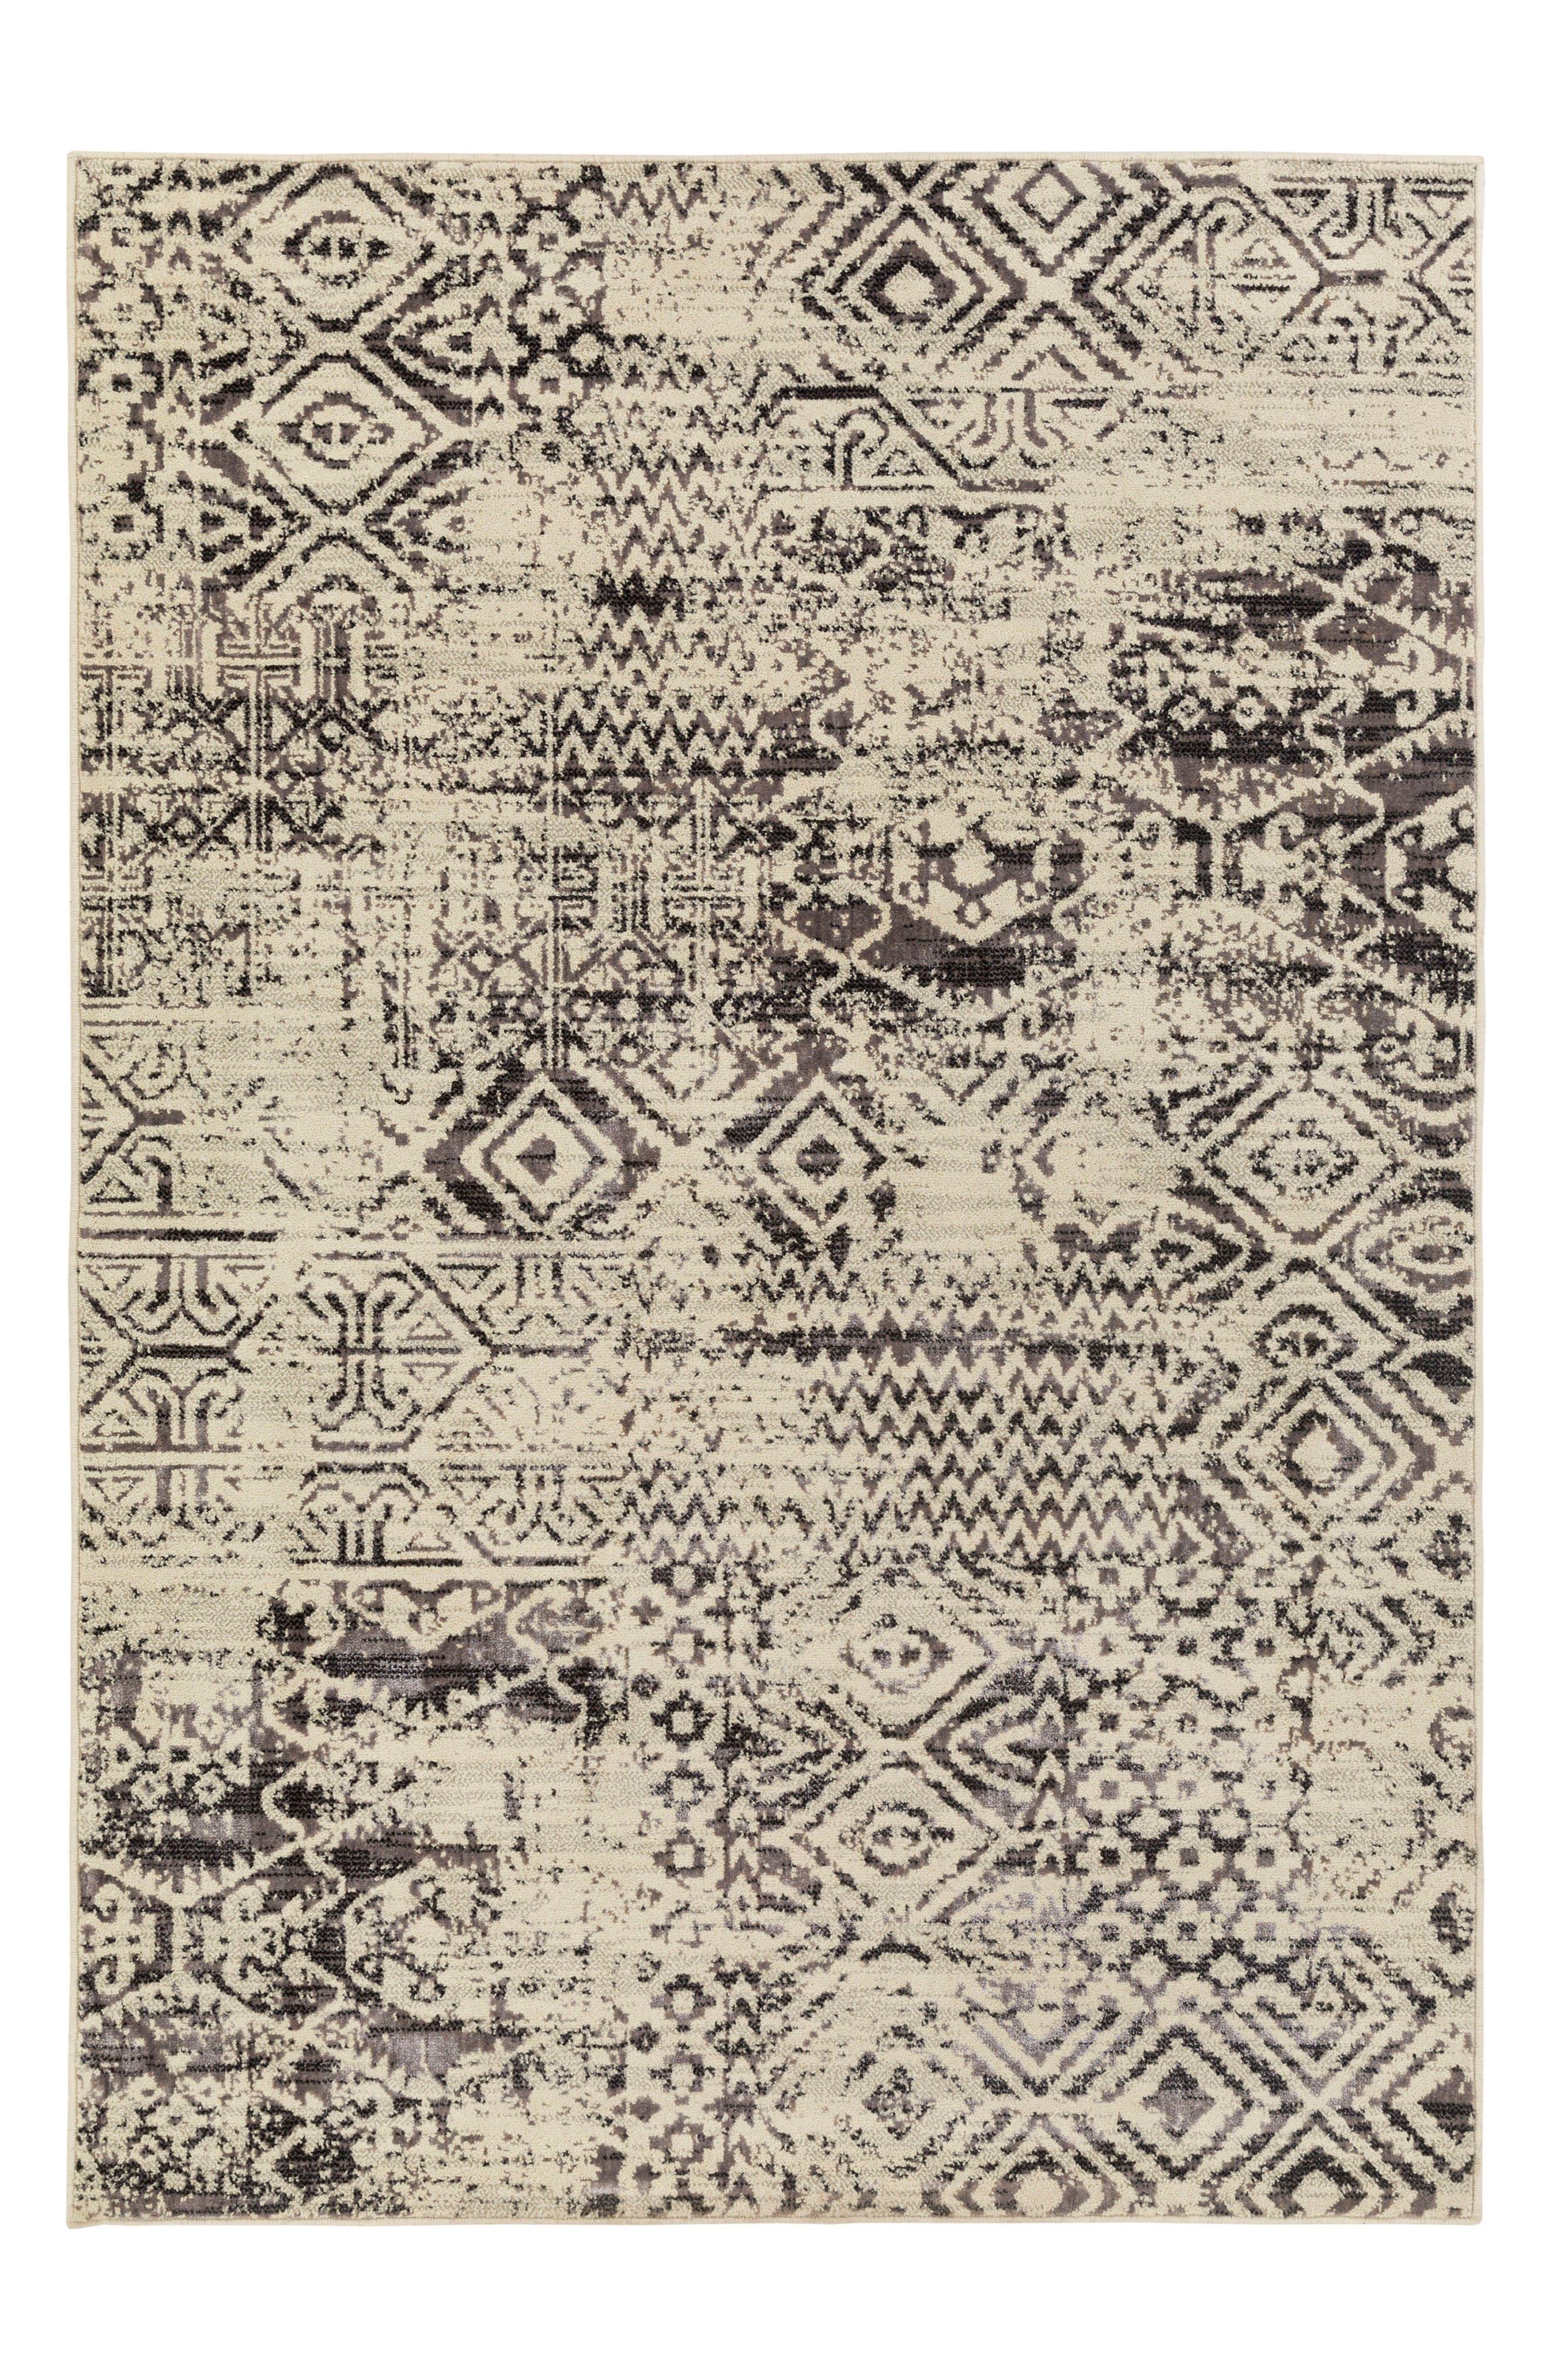 Stretto Global Maze Rug,                             Main thumbnail 1, color,                             250